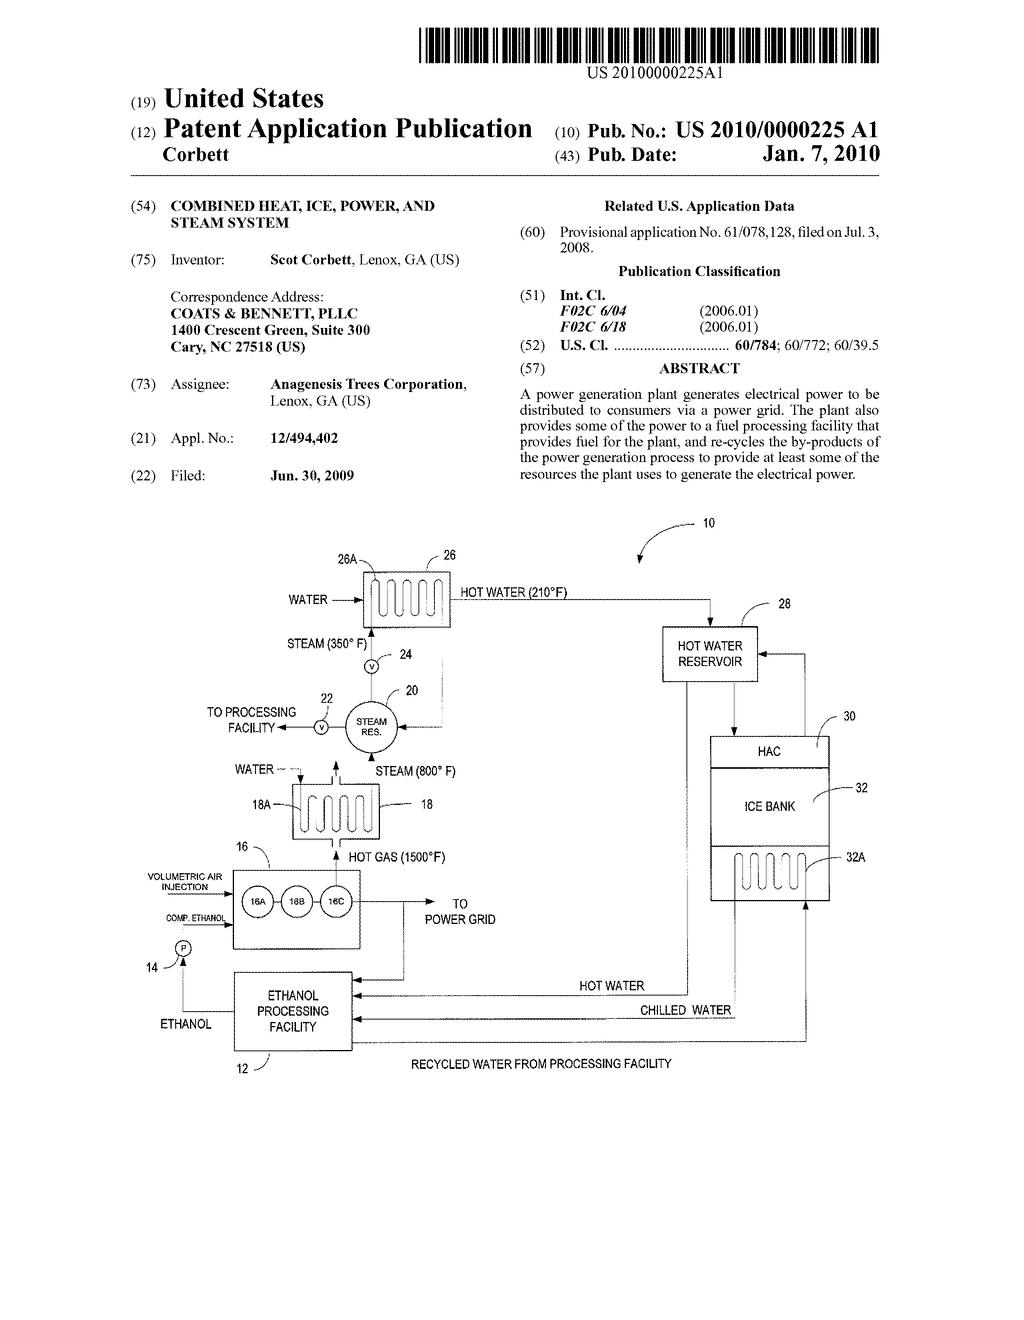 Combined Heat Ice Power And Steam System Diagram Schematic Rocket Engine Schematics Image 01